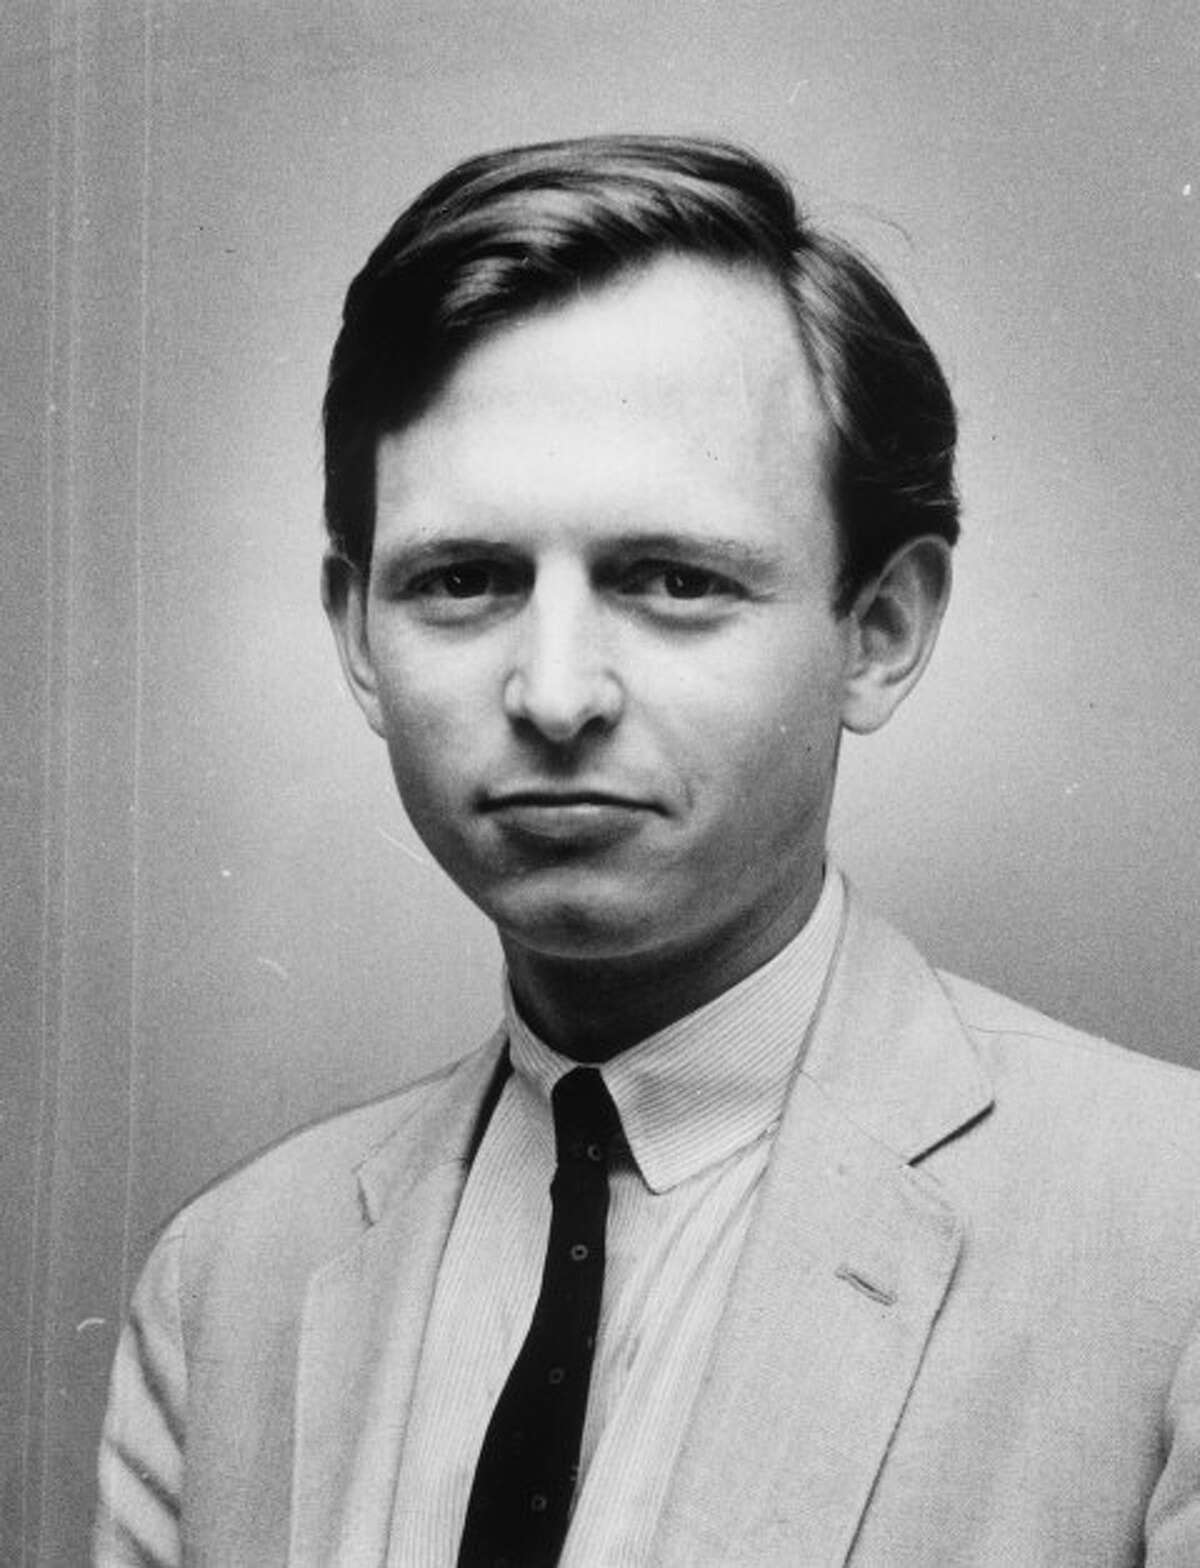 Tom Wolfe as a Washington Post staff writer in 1961.